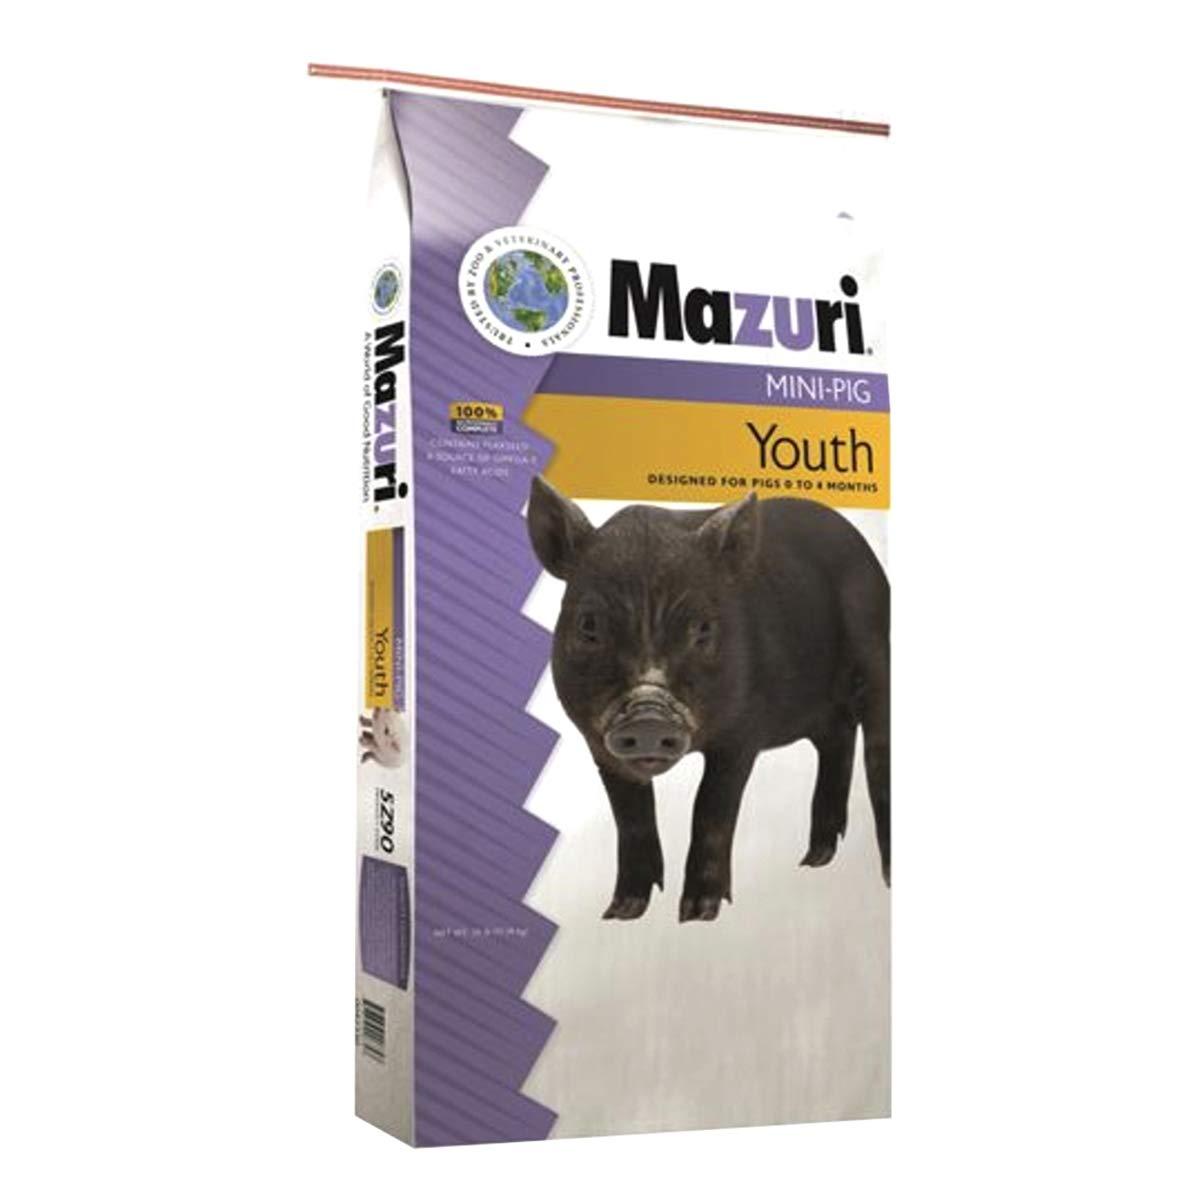 Purina Mills Mazuri Mini Pig Youth 25 lb.